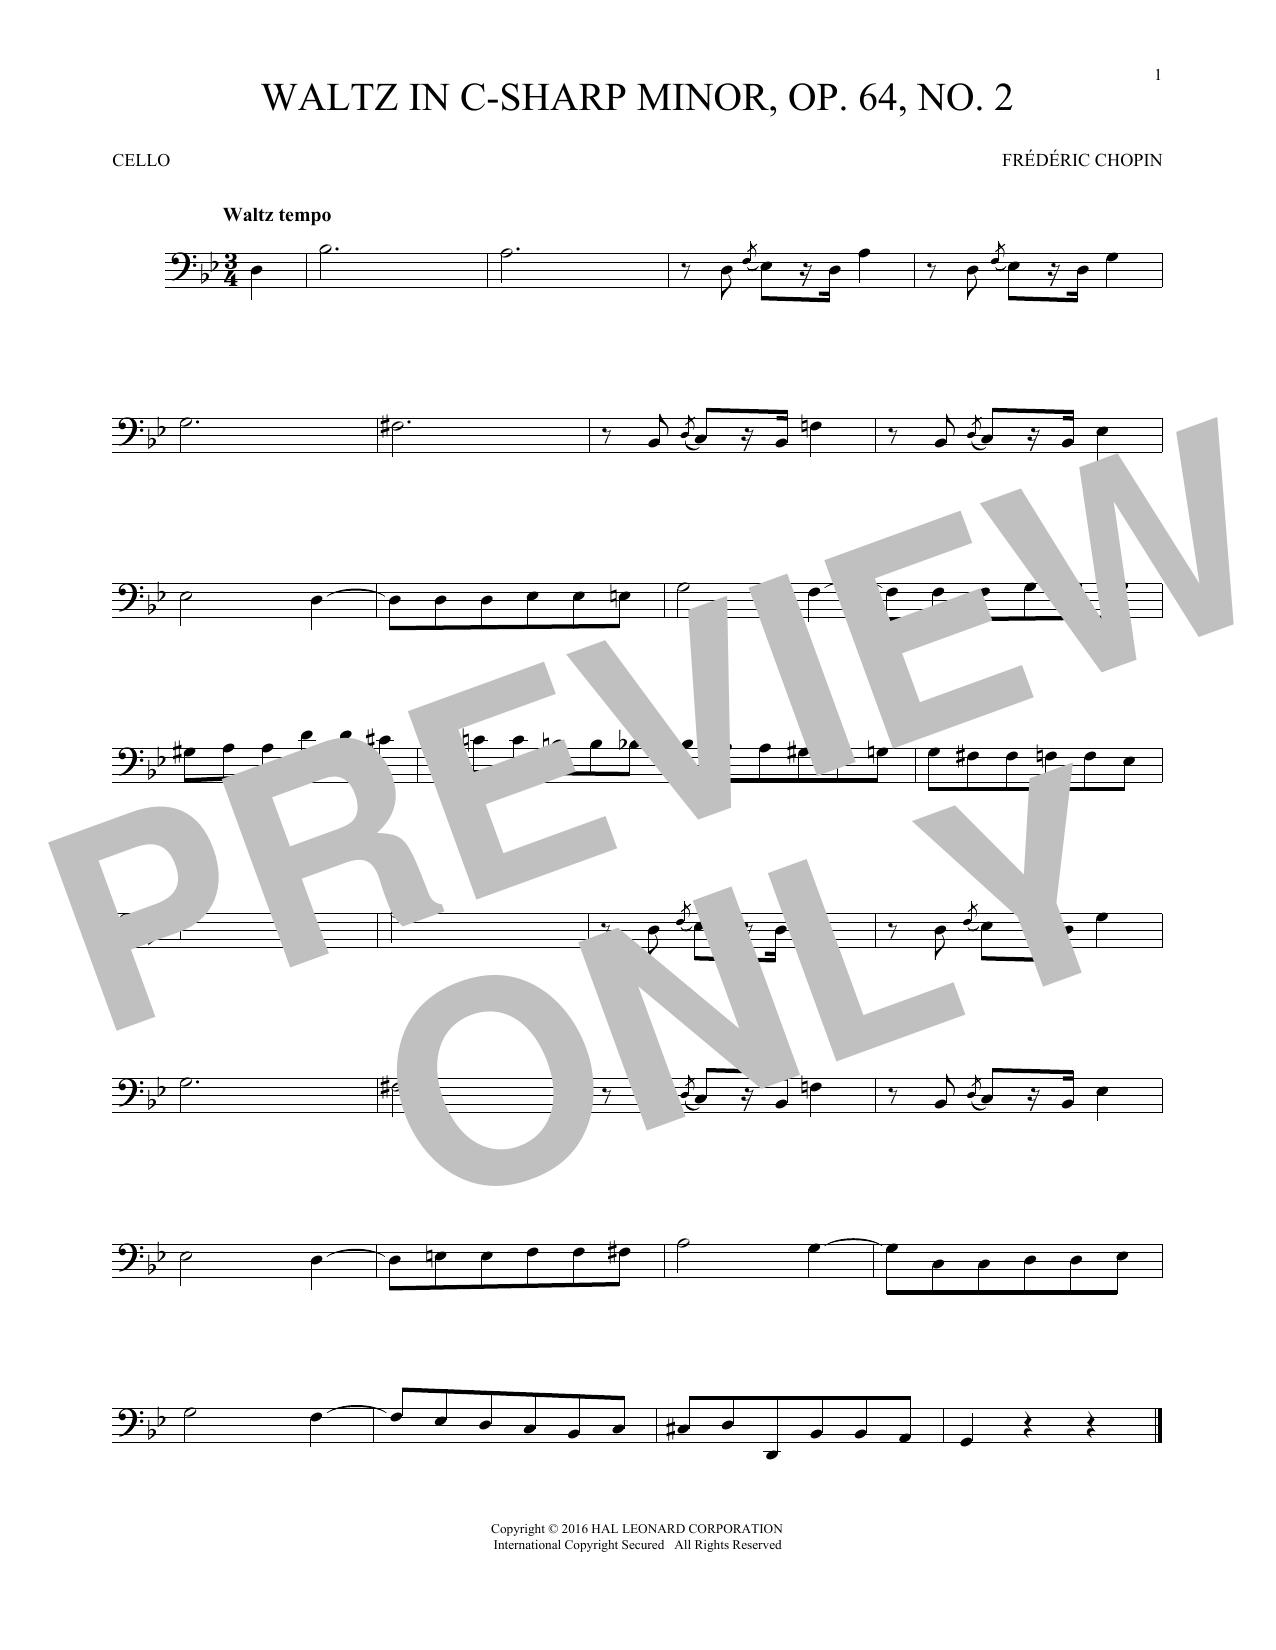 Waltz In C-Sharp Minor, Op. 64, No. 2 (Cello Solo)